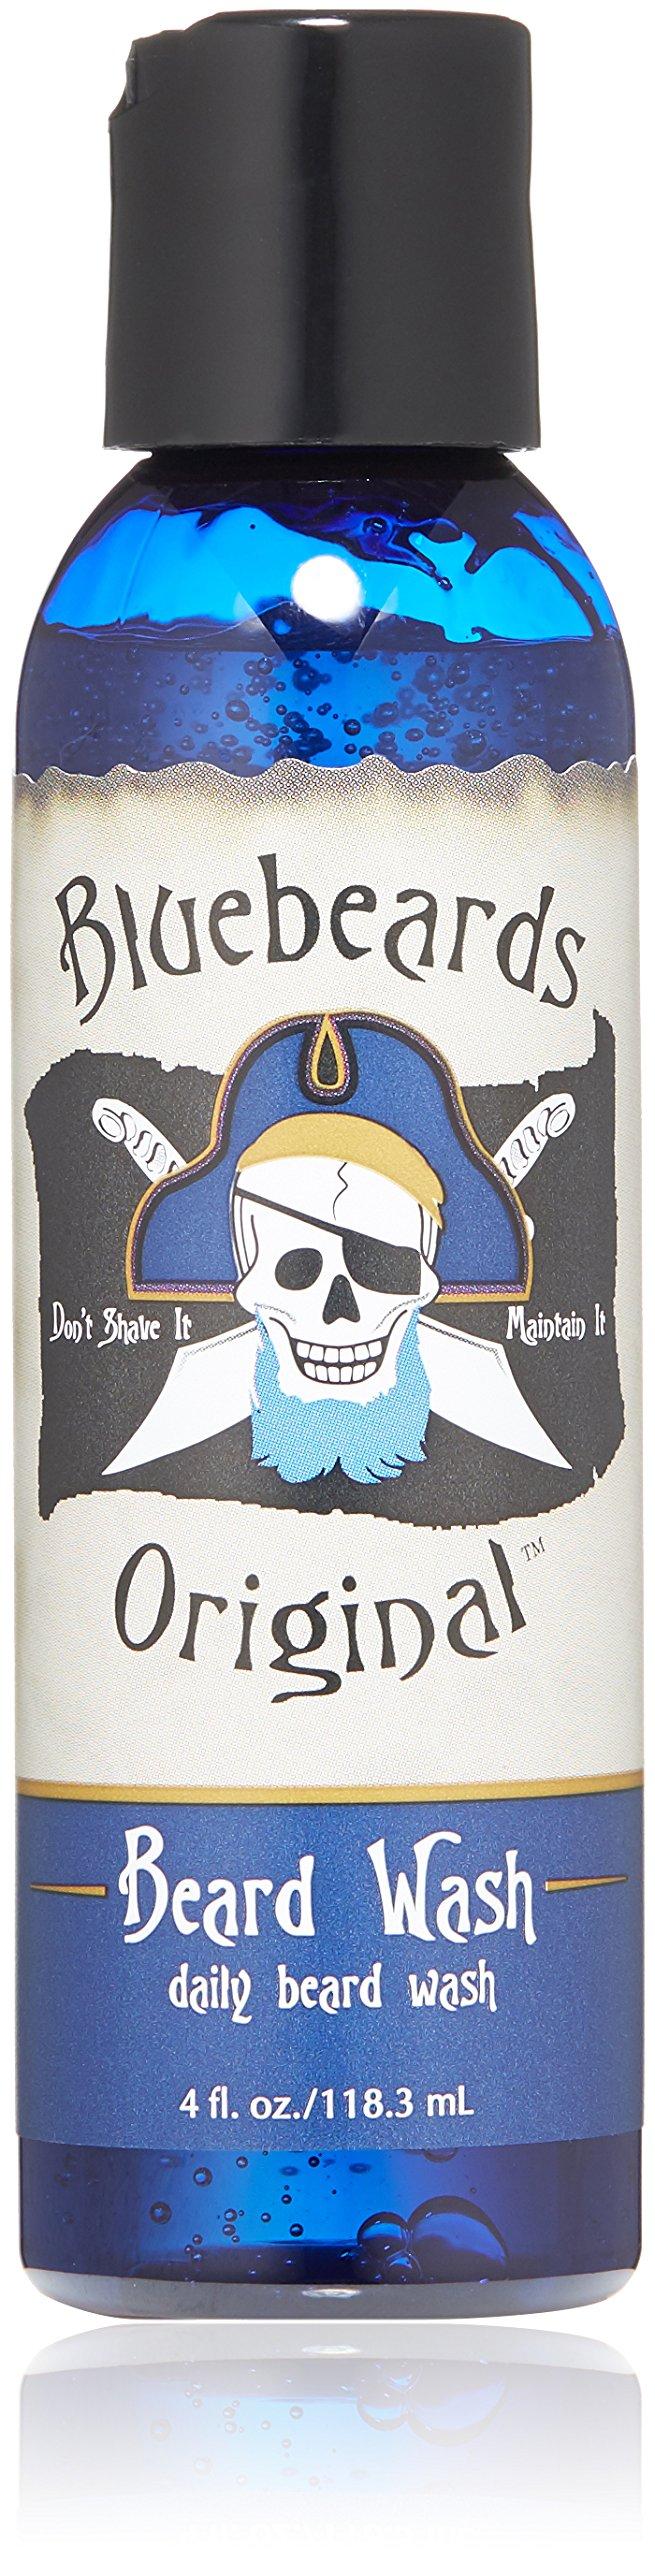 Bluebeards Original Beard Wash, 4 oz.